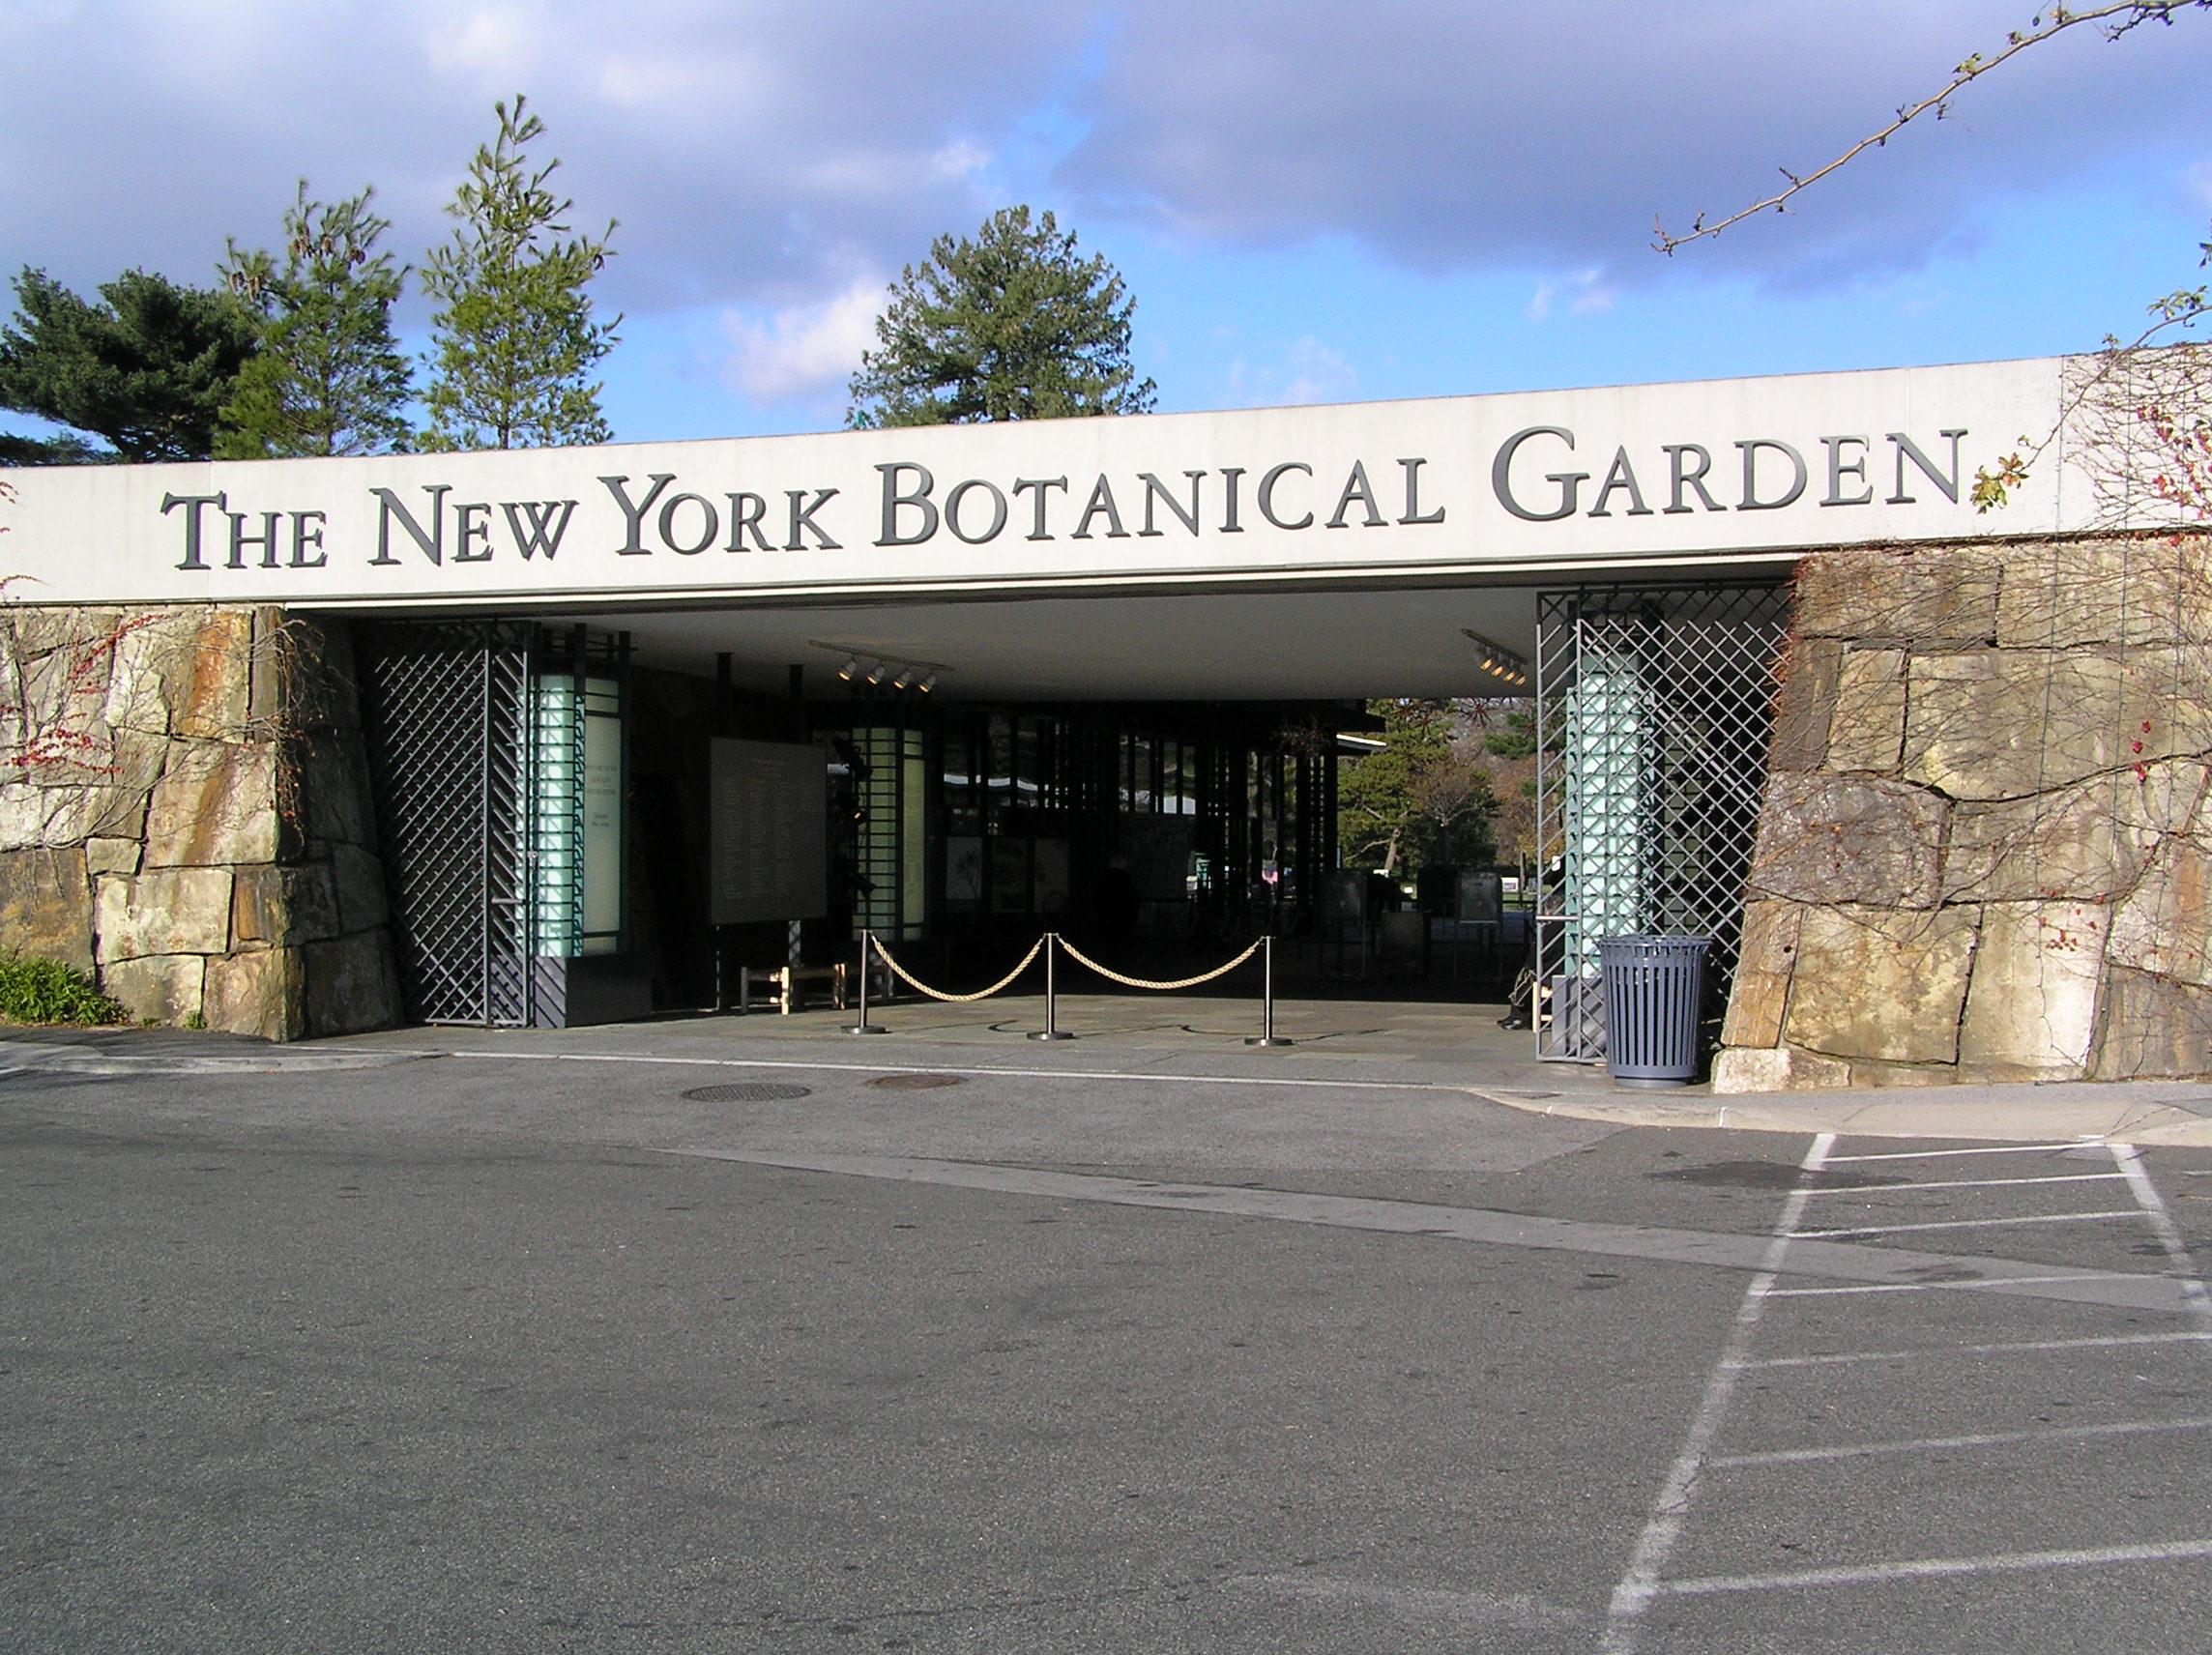 Genial File:NY Botanical Garden